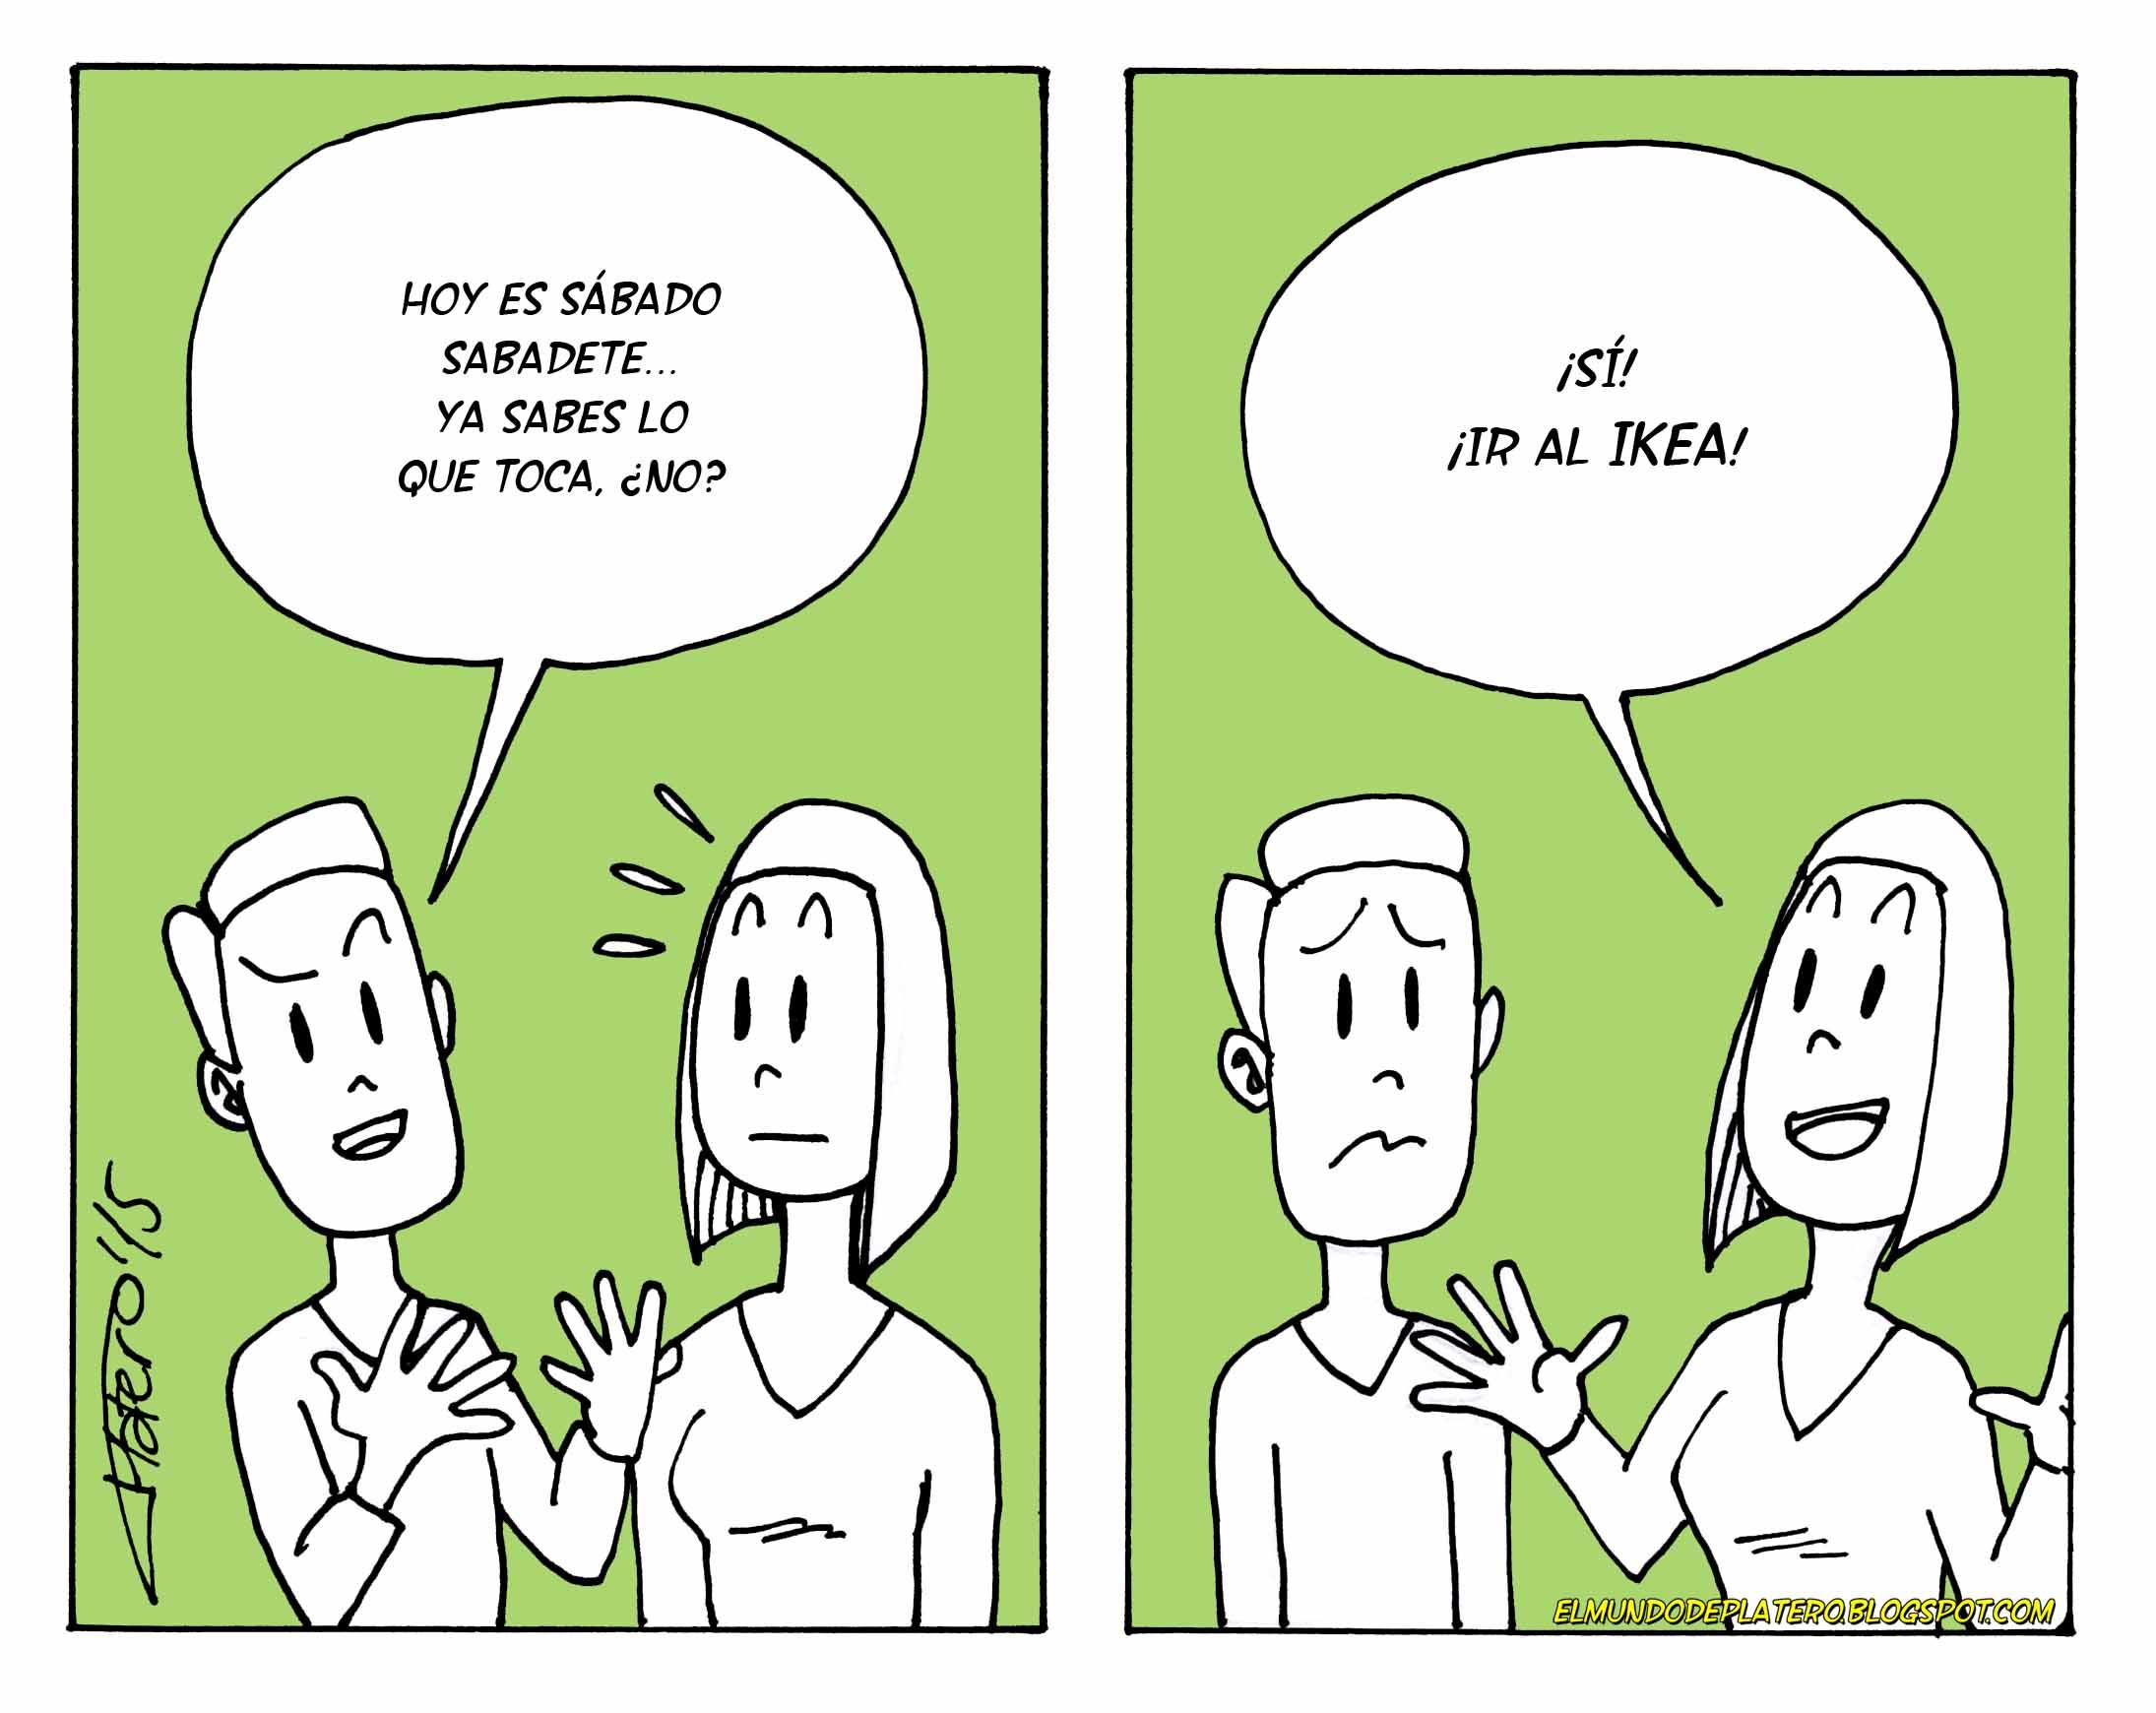 Sábado_sabadete_toca_Ikea_elmundodeplatero_josé_luis_platero.jpg